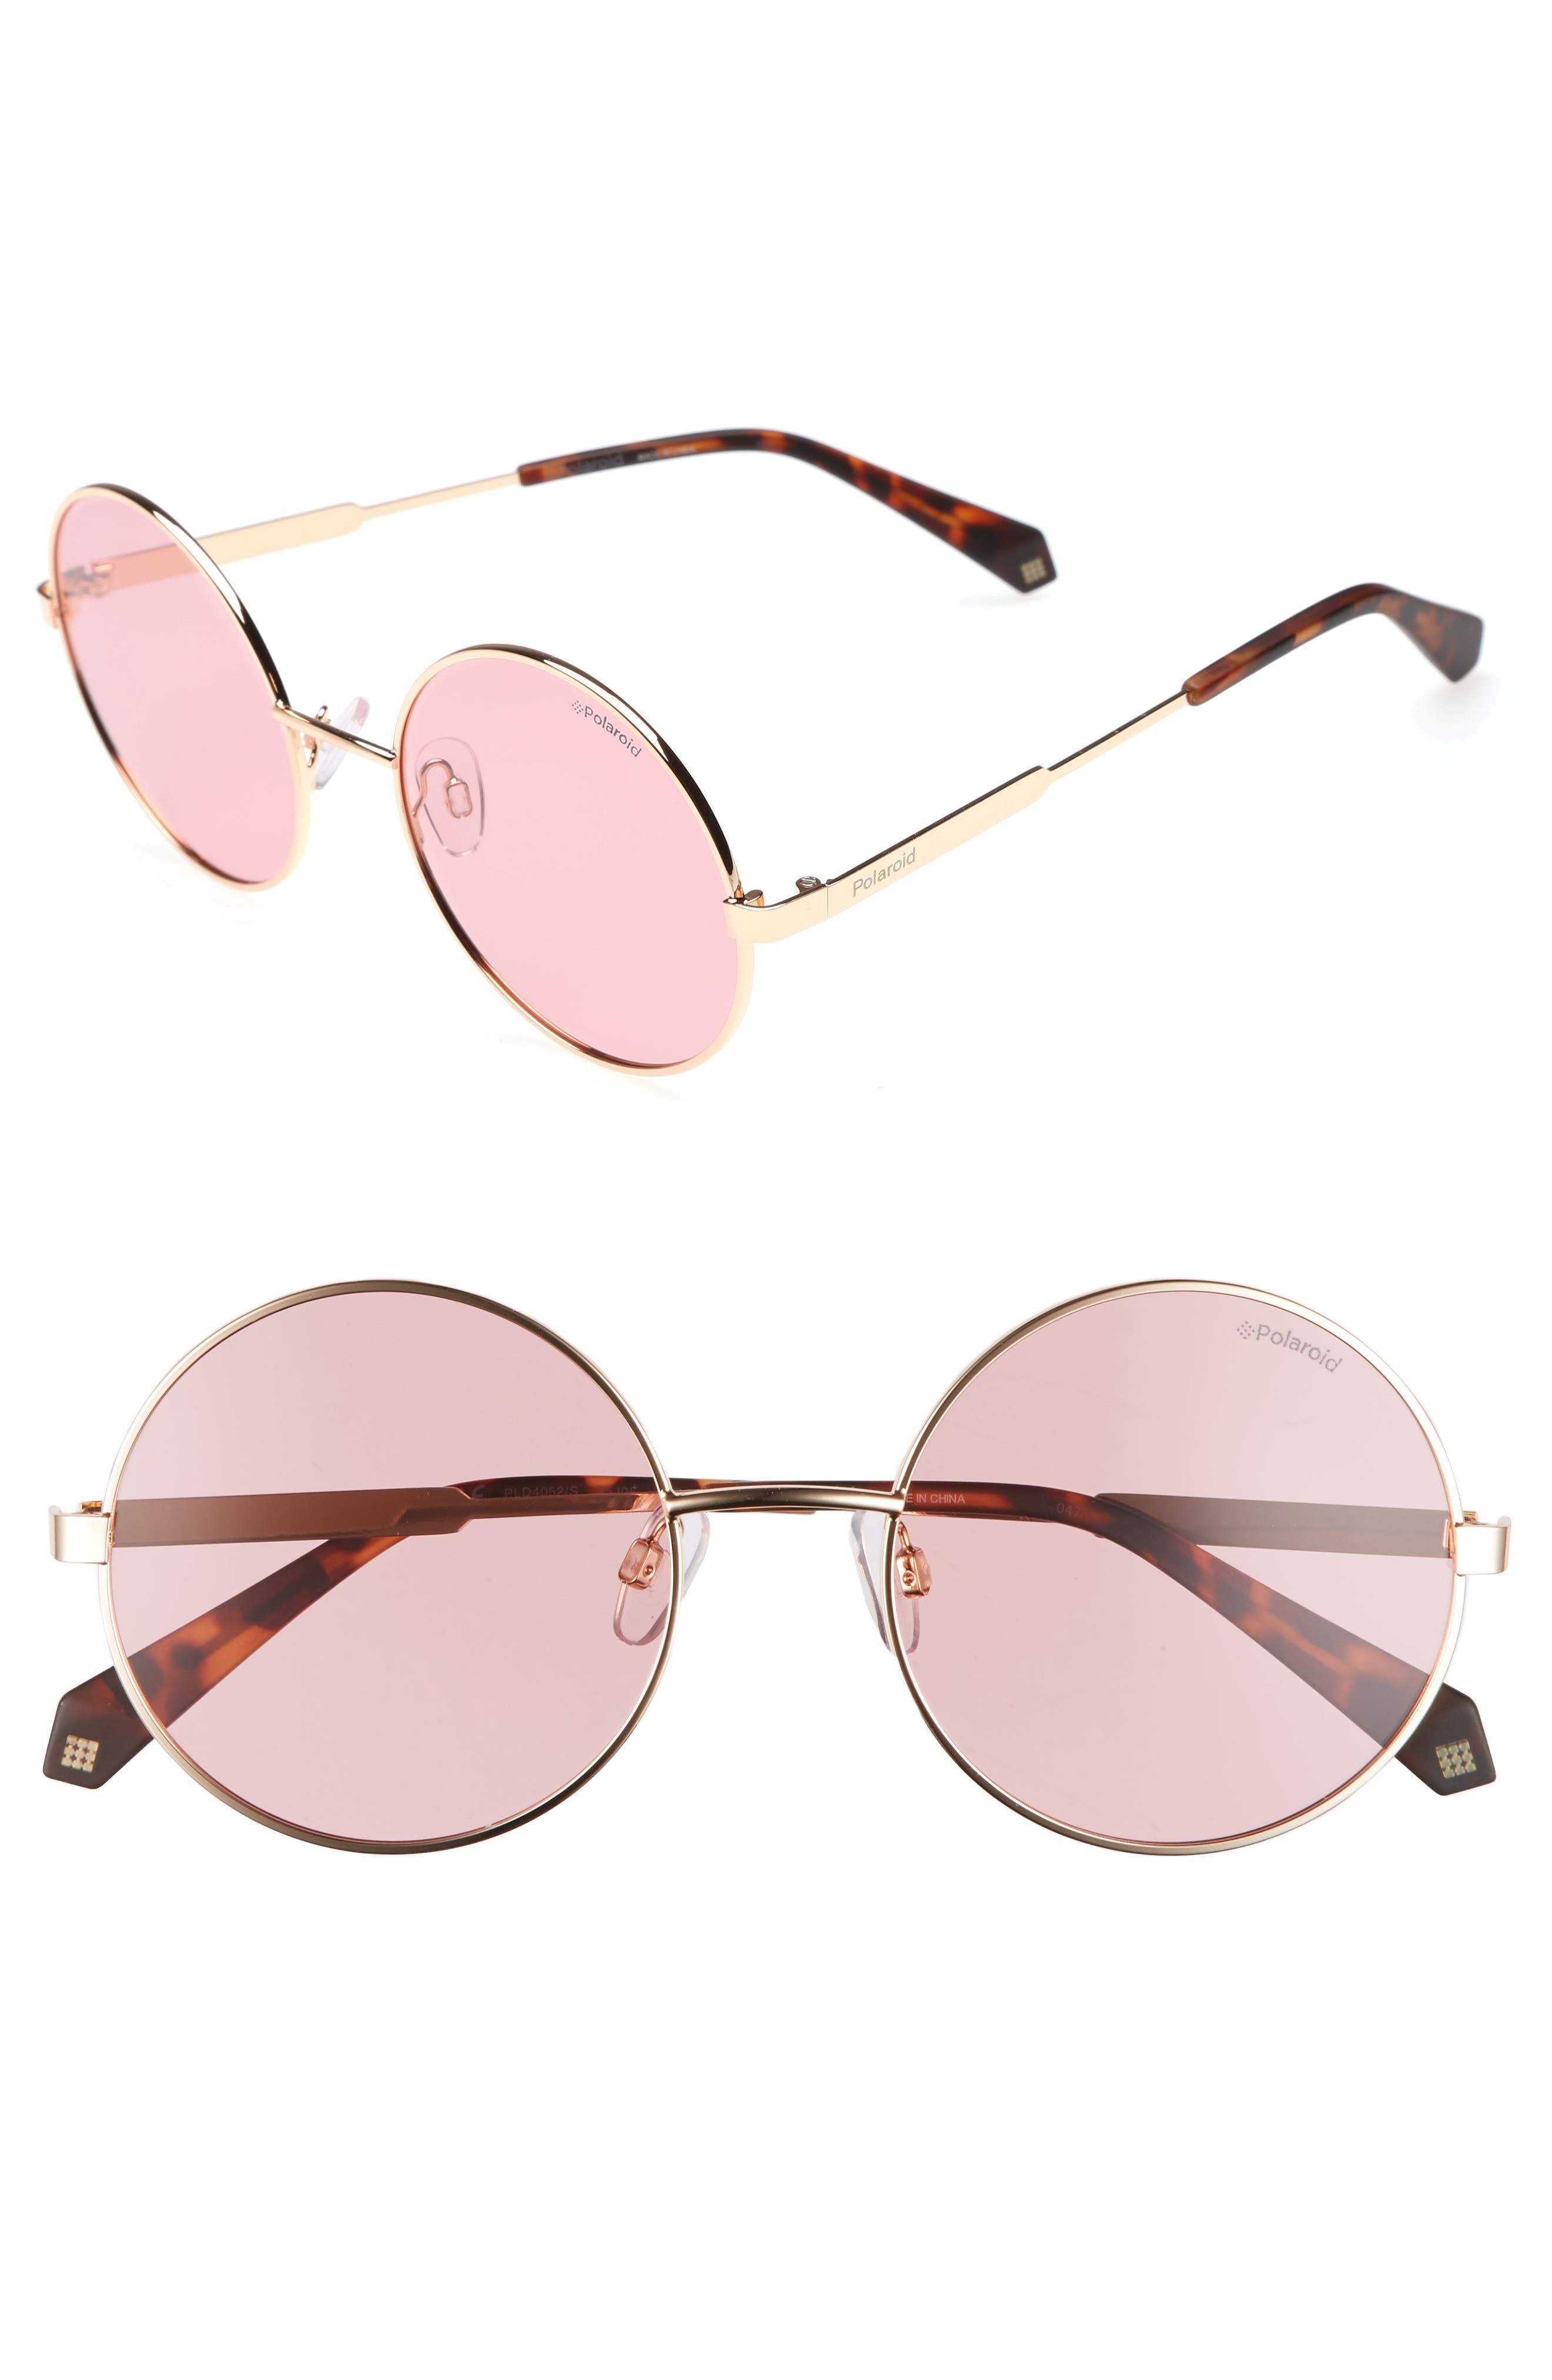 55mm Polarized Round Sunglasses,                             Main thumbnail 3, color,